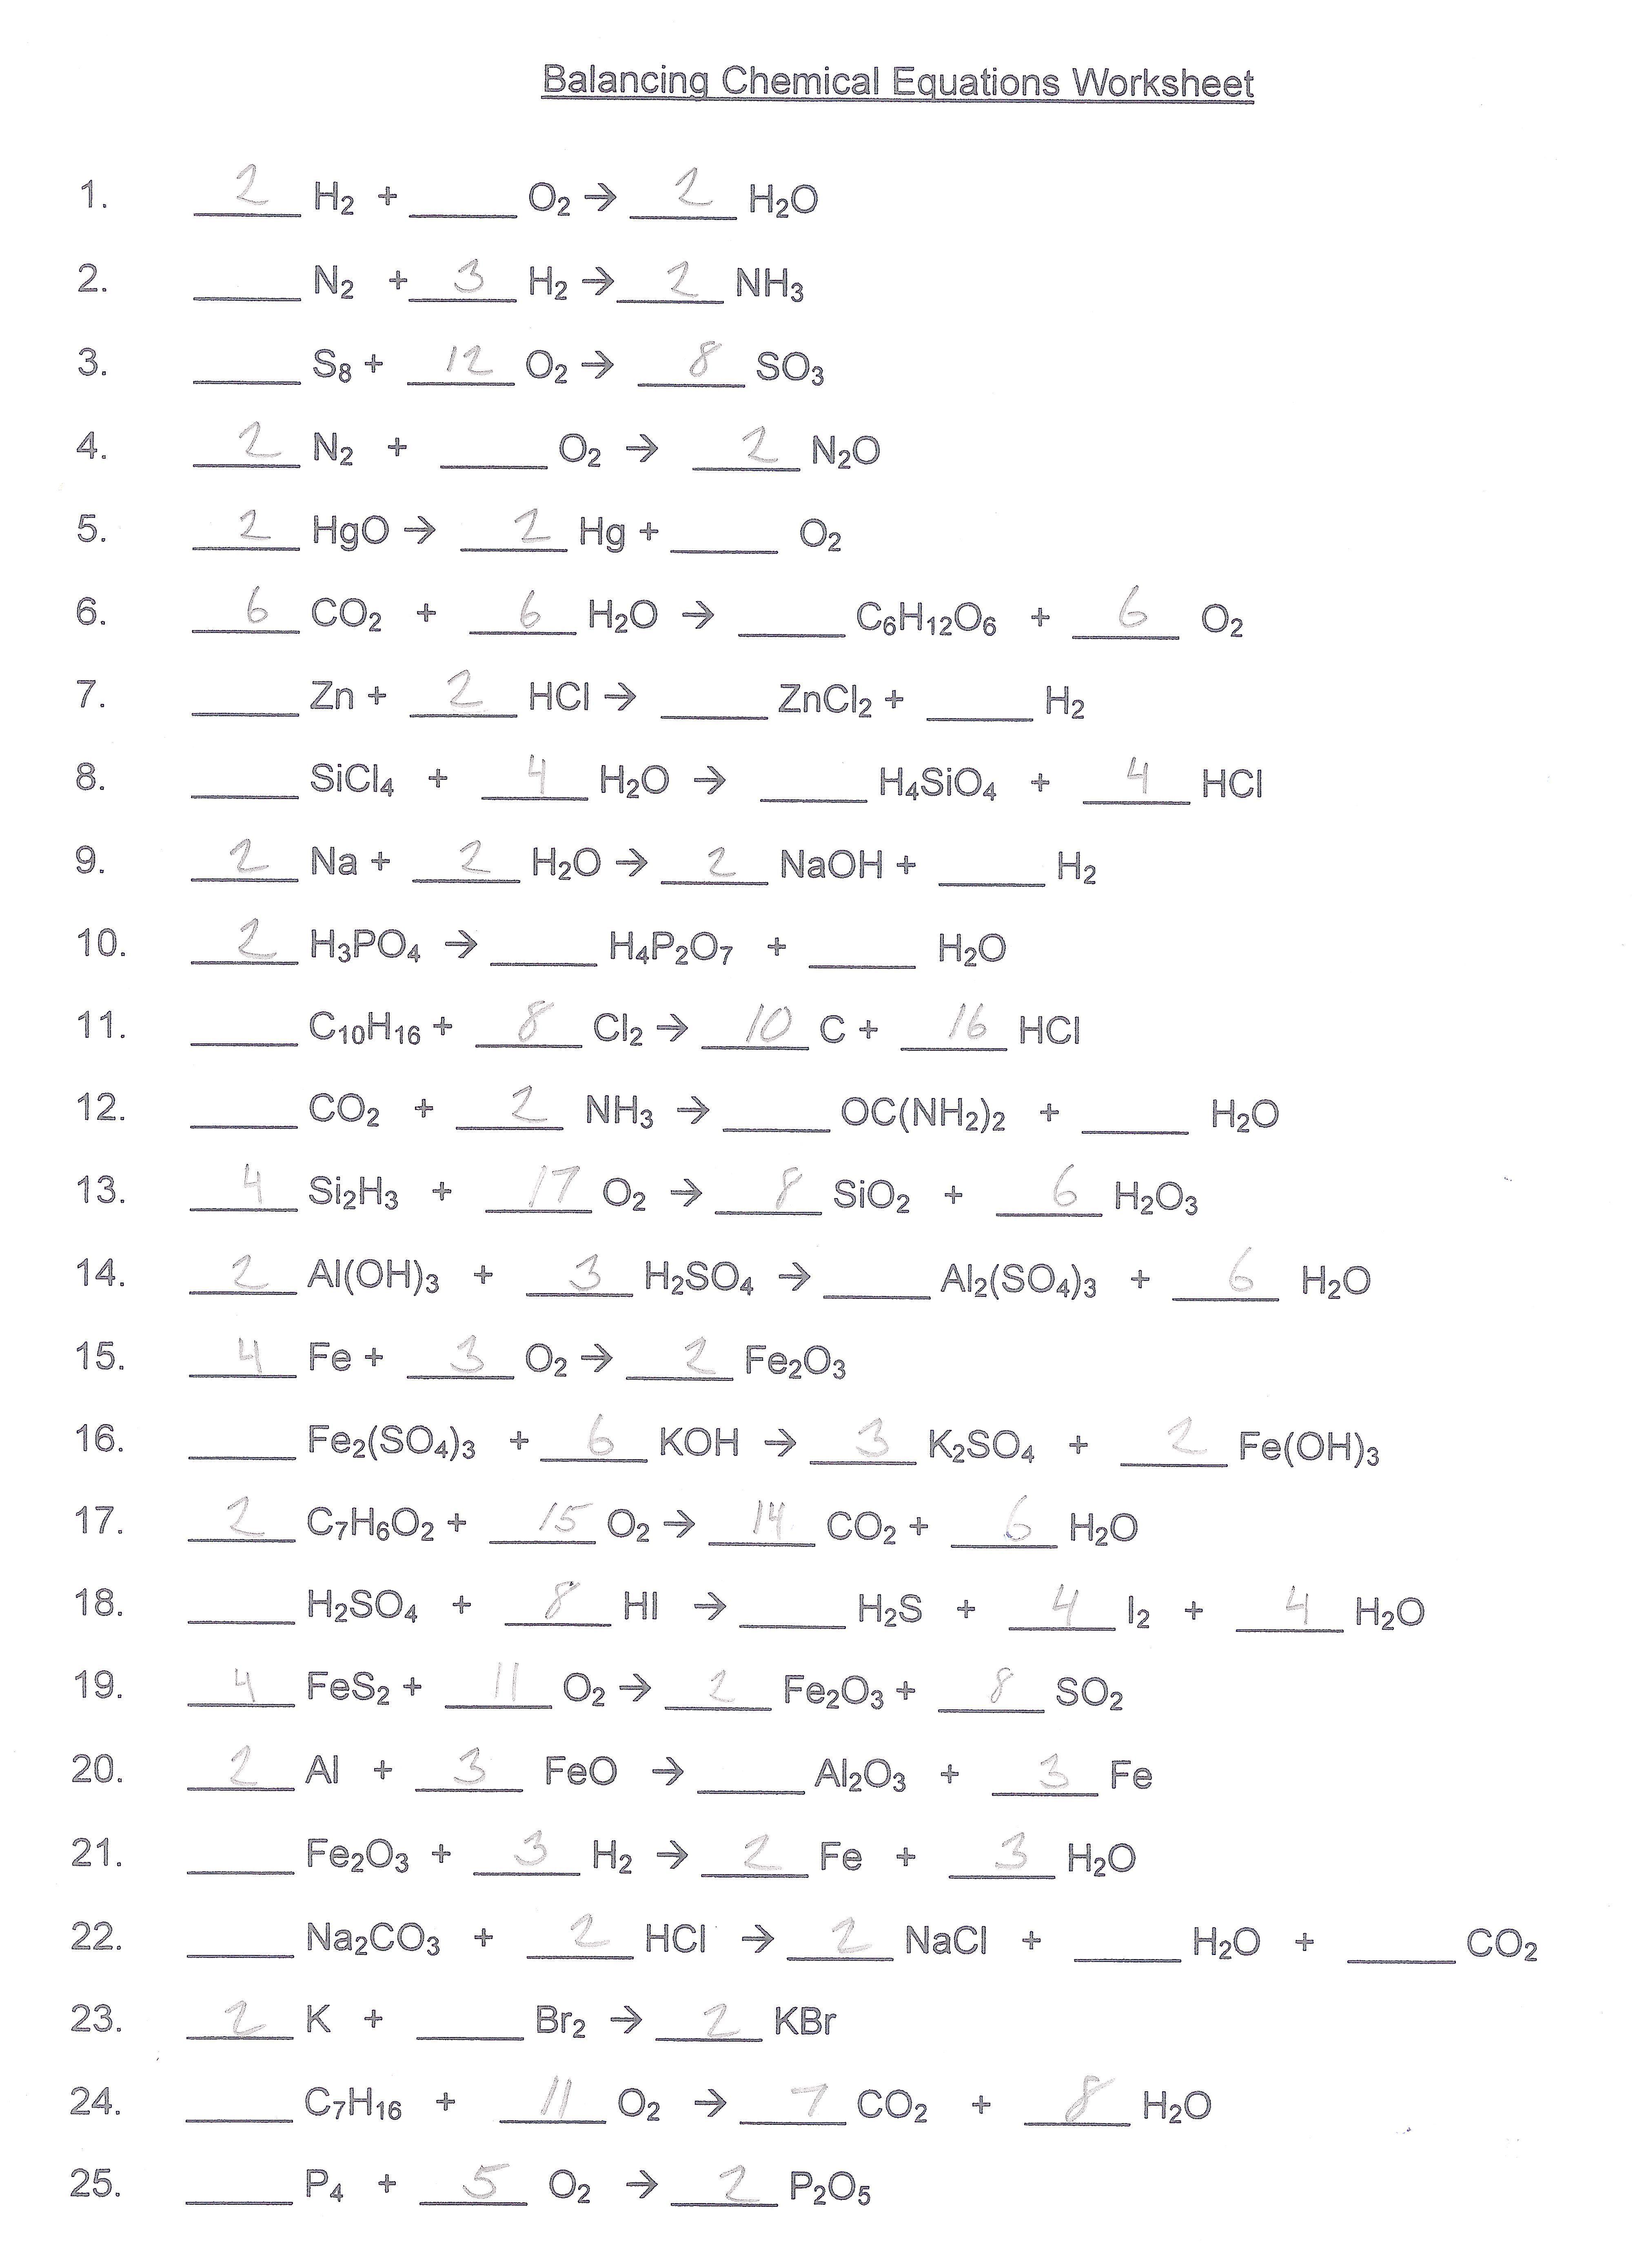 37 Simple Balancing Equations Worksheet Ideas  [ 5558 x 4007 Pixel ]